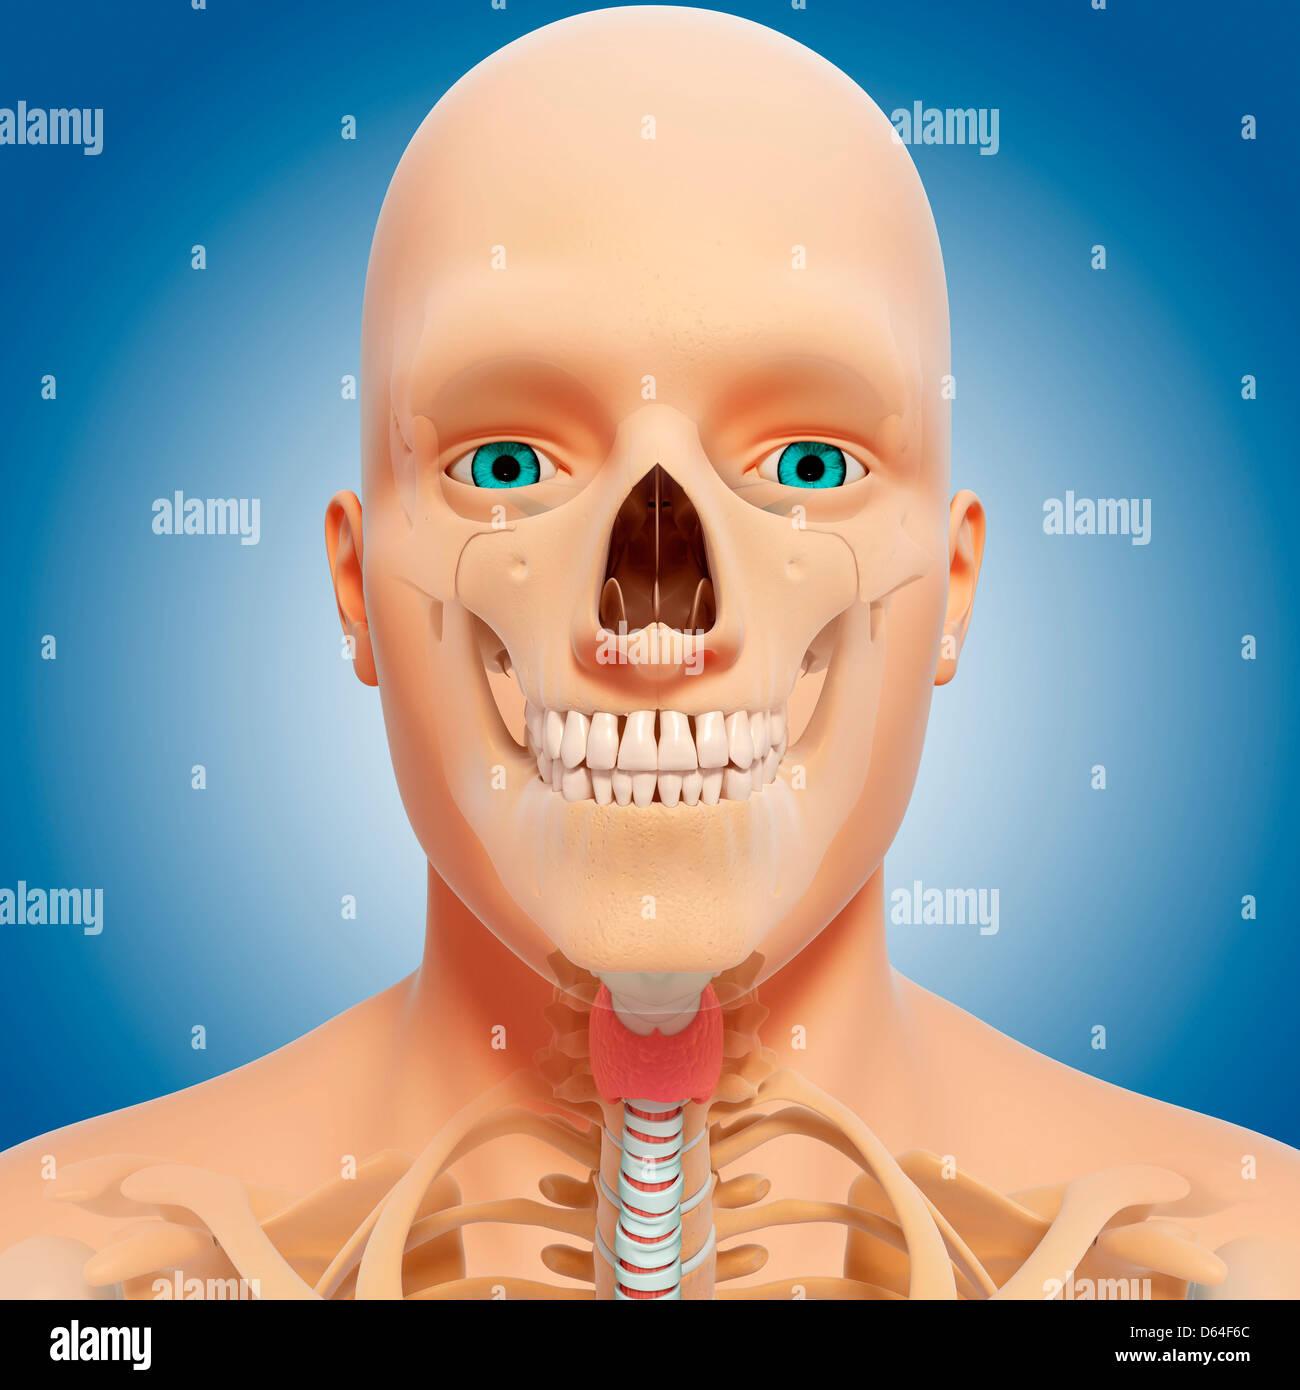 Nose Cartilage Stock Photos & Nose Cartilage Stock Images - Alamy